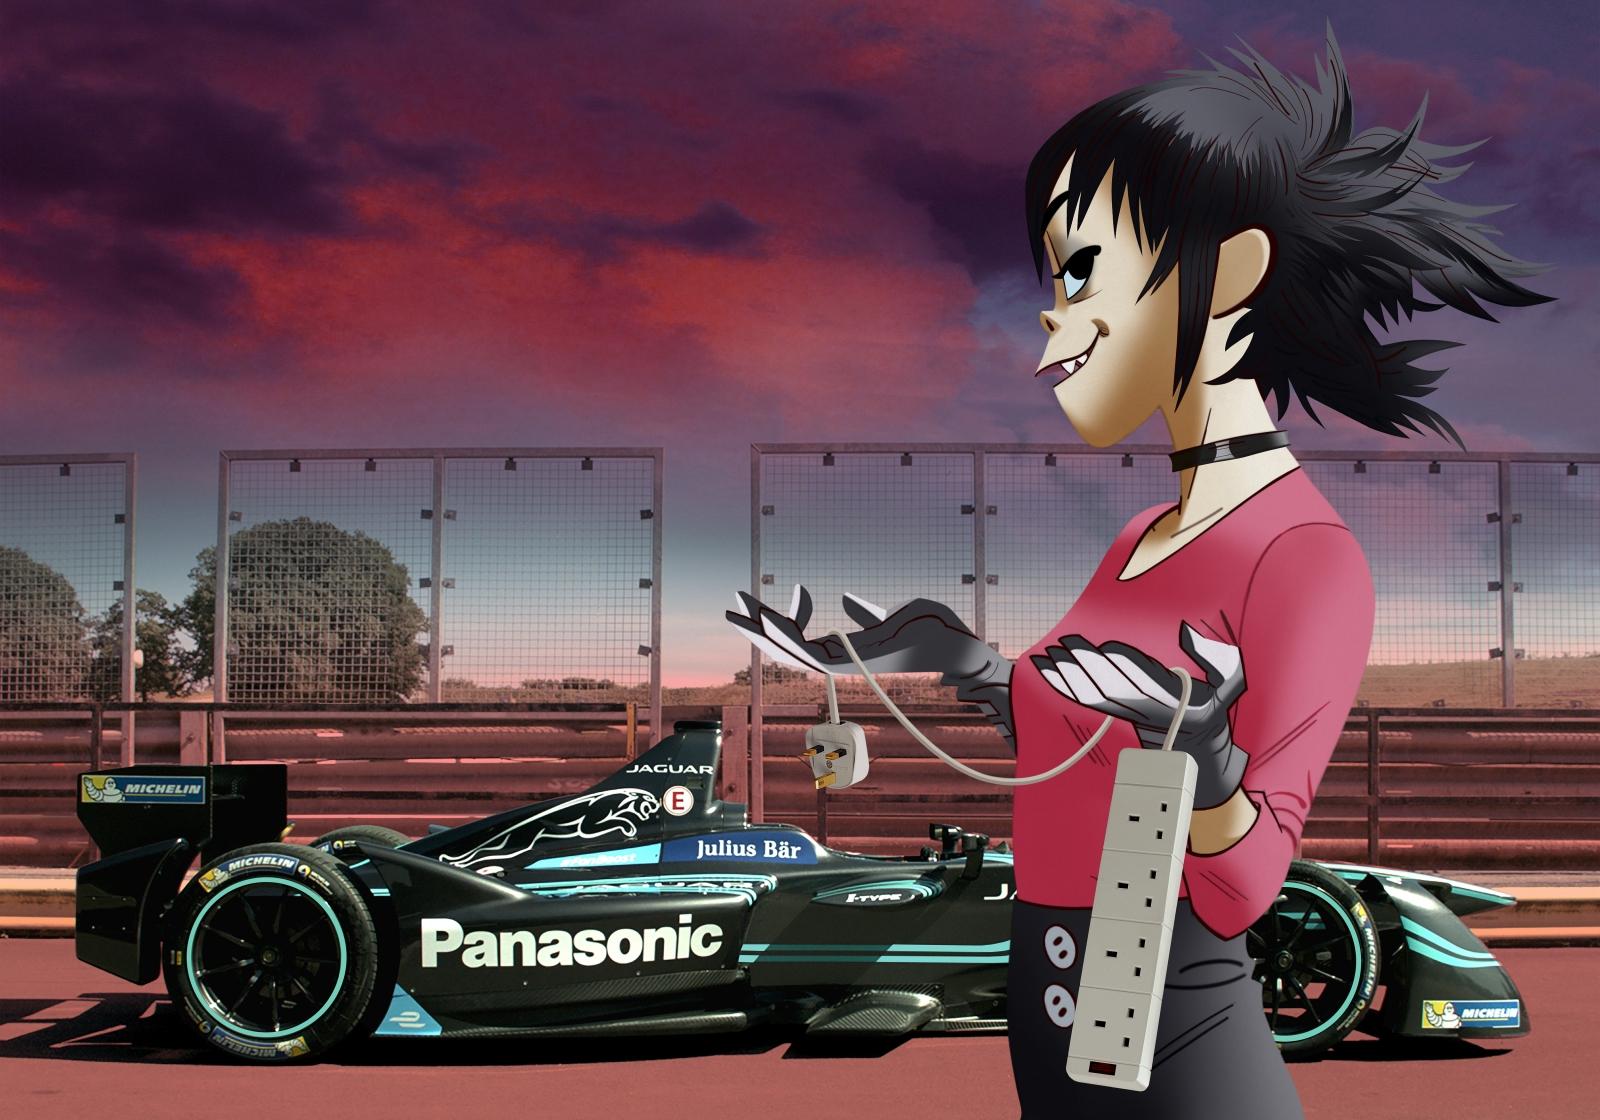 Jaguar's Formula E racing car